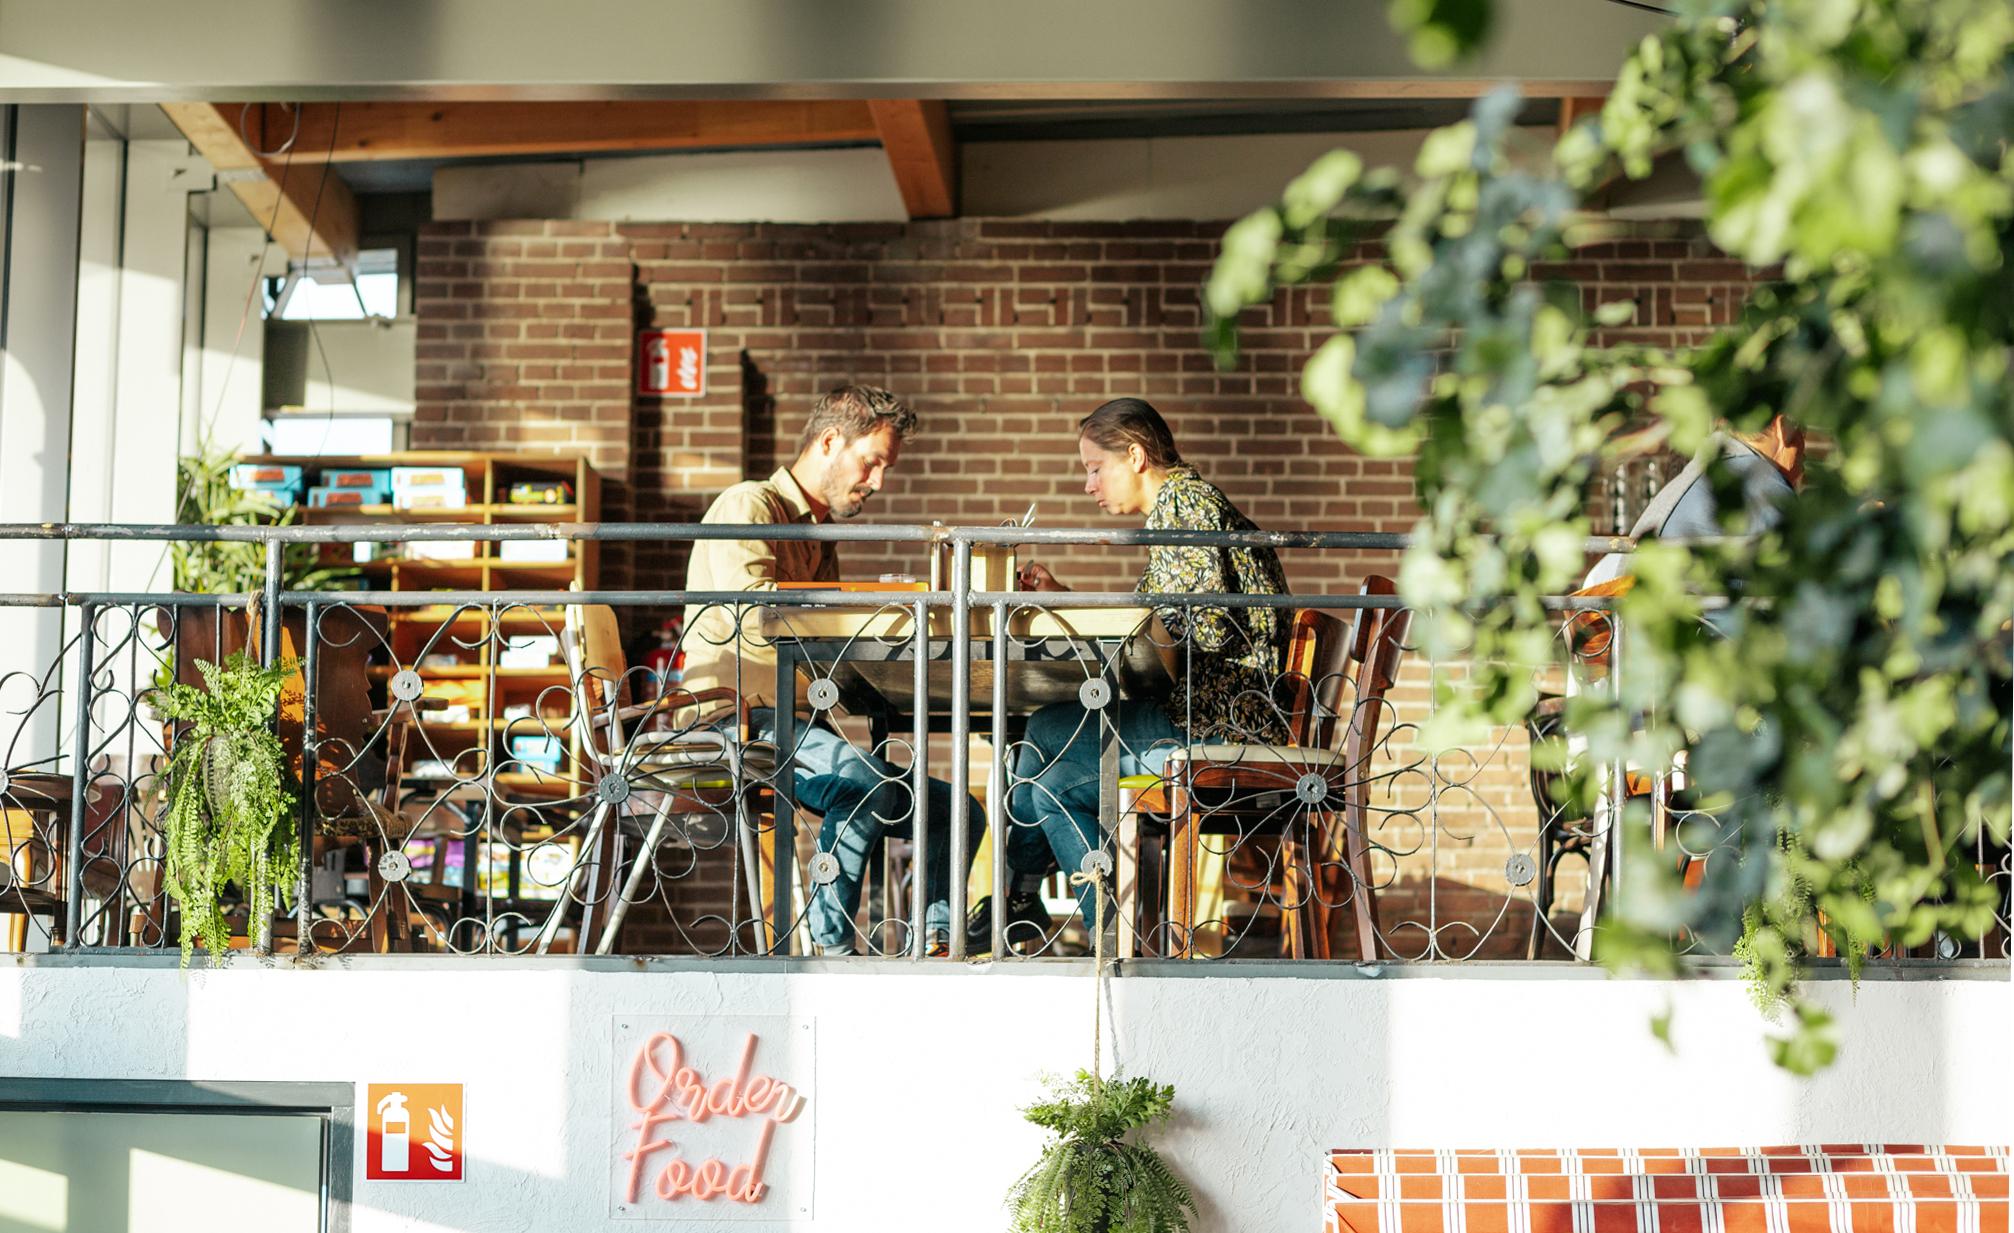 Mooie Boules Haarlem Eten